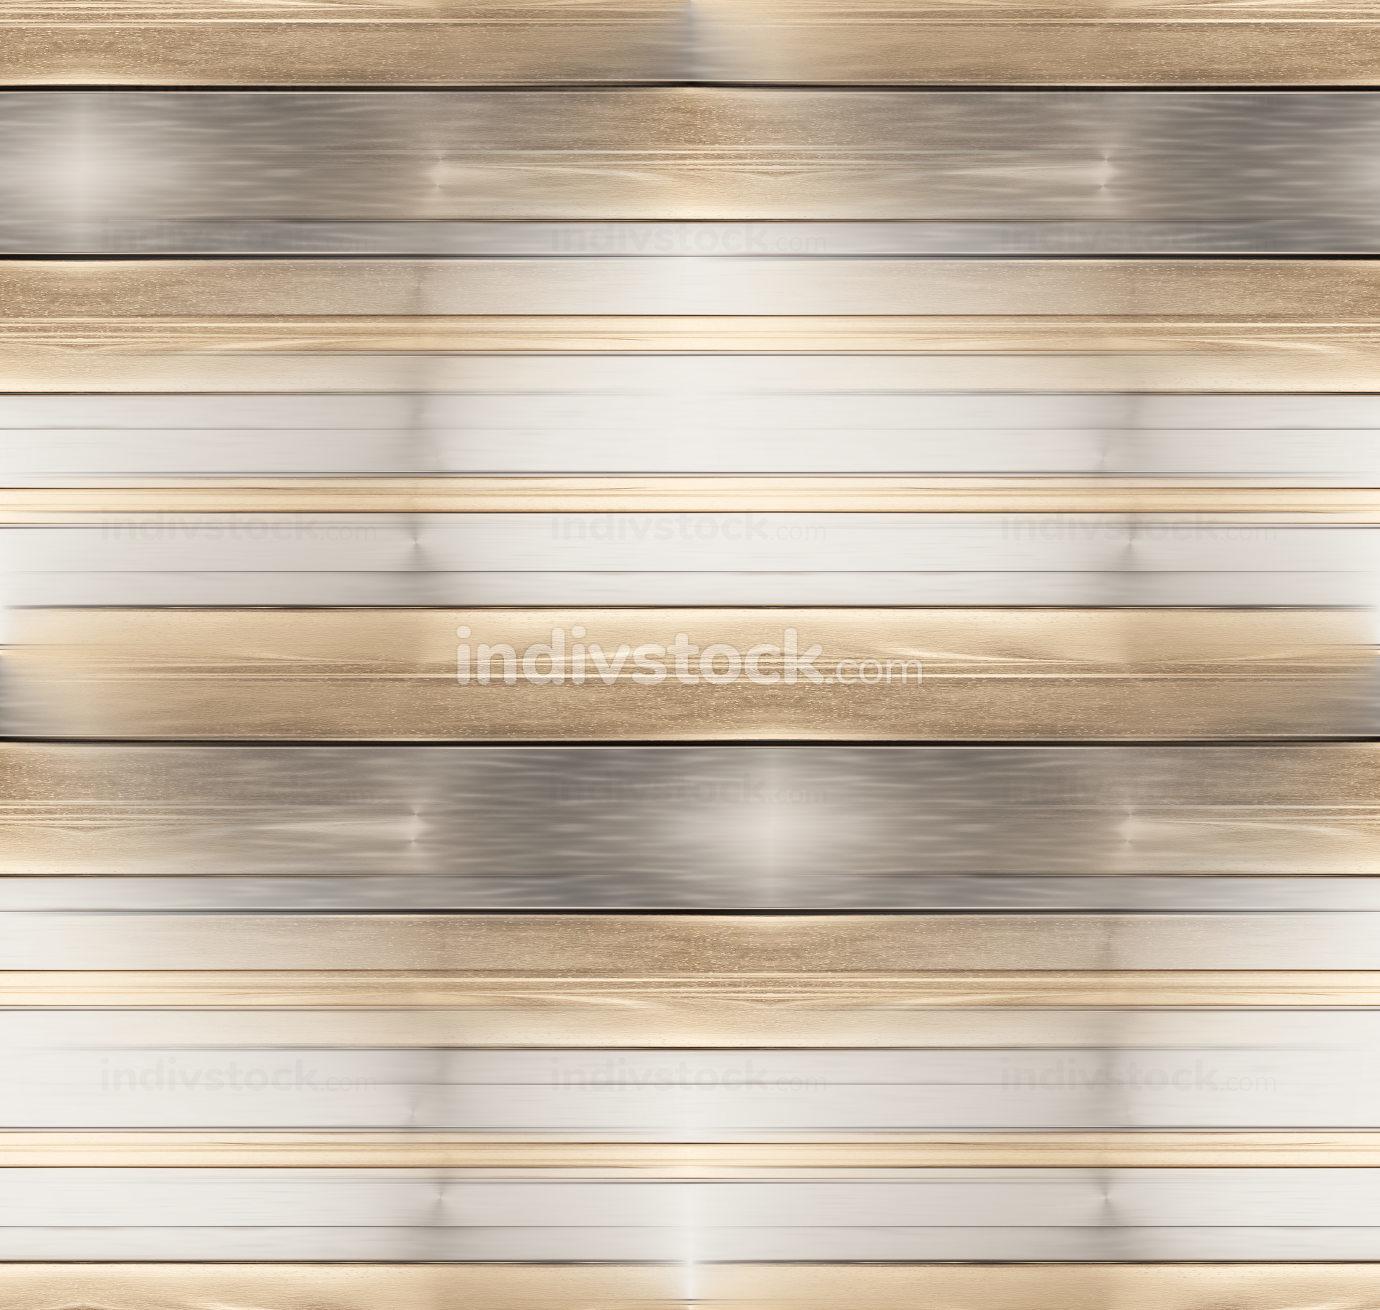 free download: seamless metallic creative background 3d-illustration golden str